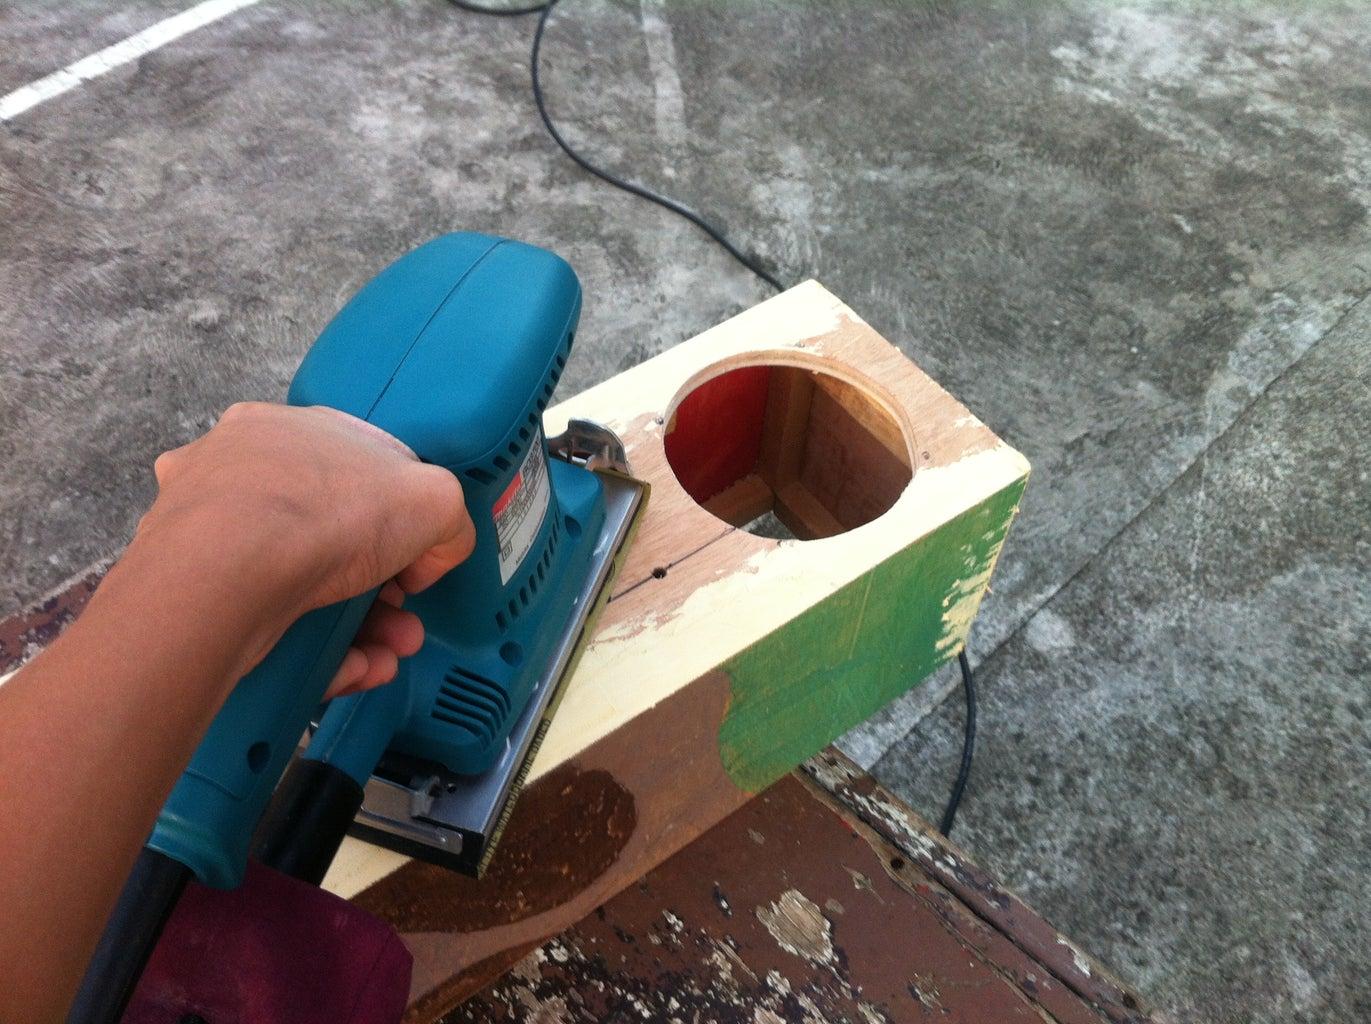 Sanding the Assembled Enclosure